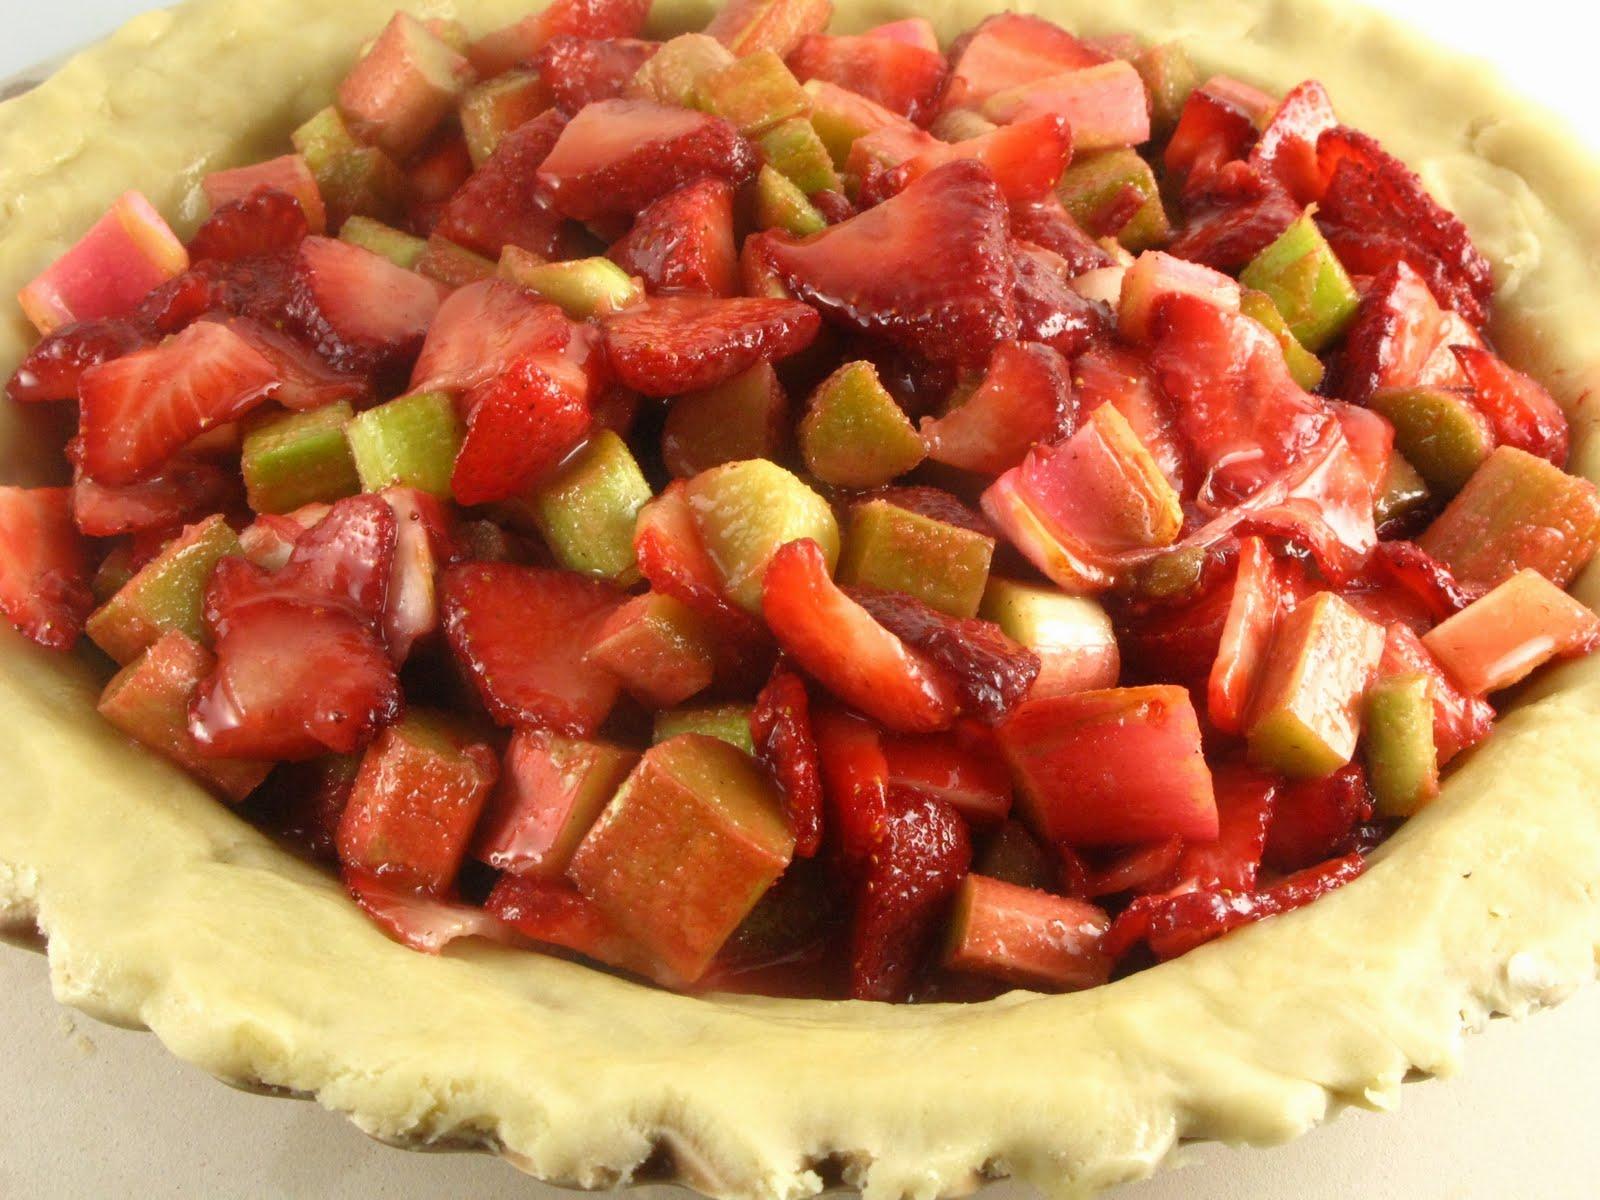 Keeping it Simple (KISBYTO): National Strawberry Rhubarb Pie Day